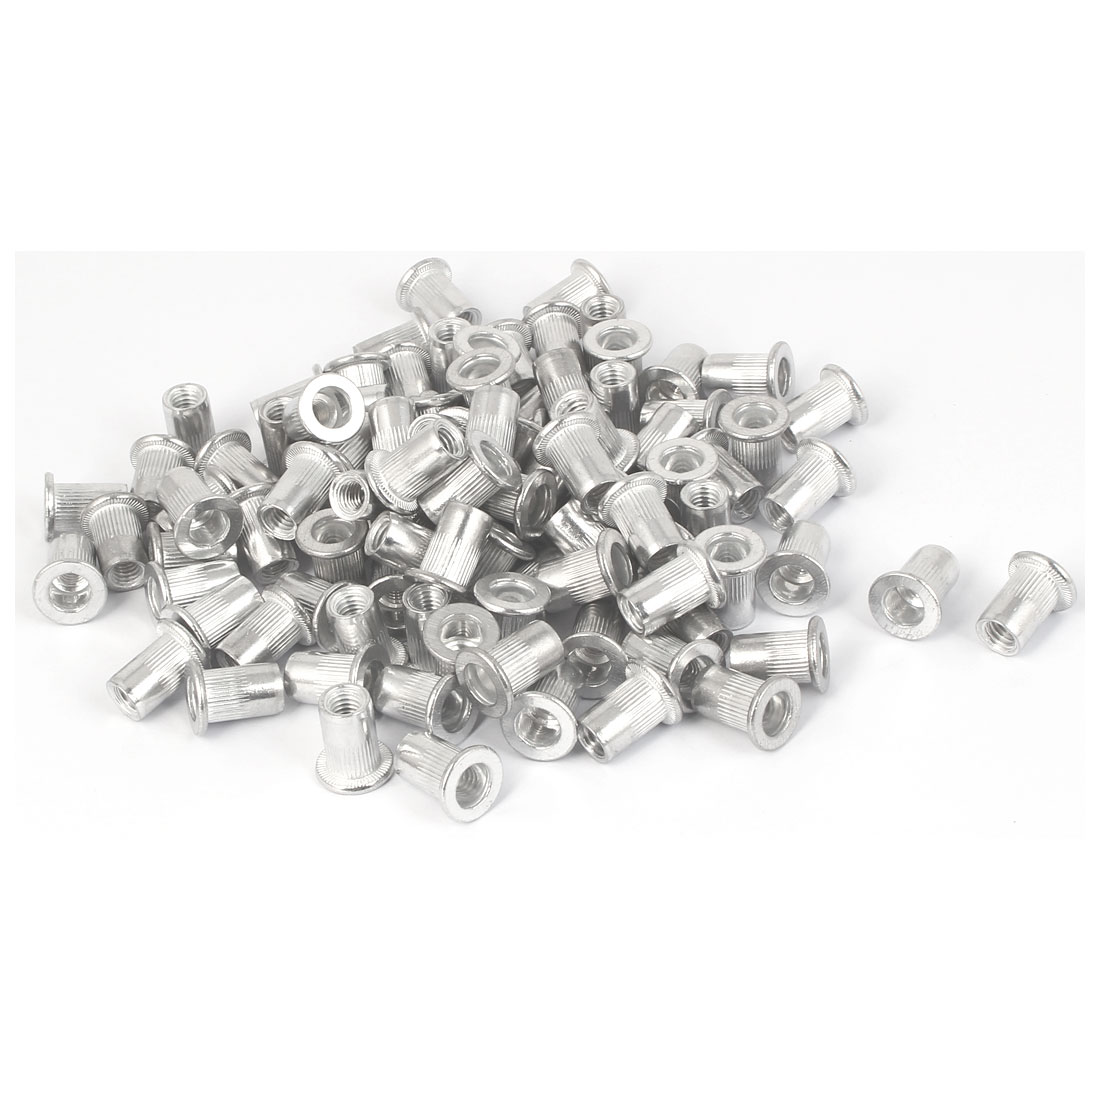 M6x15mm Aluminum Straight Knurled Blind Rivet Nut Fastener 100pcs